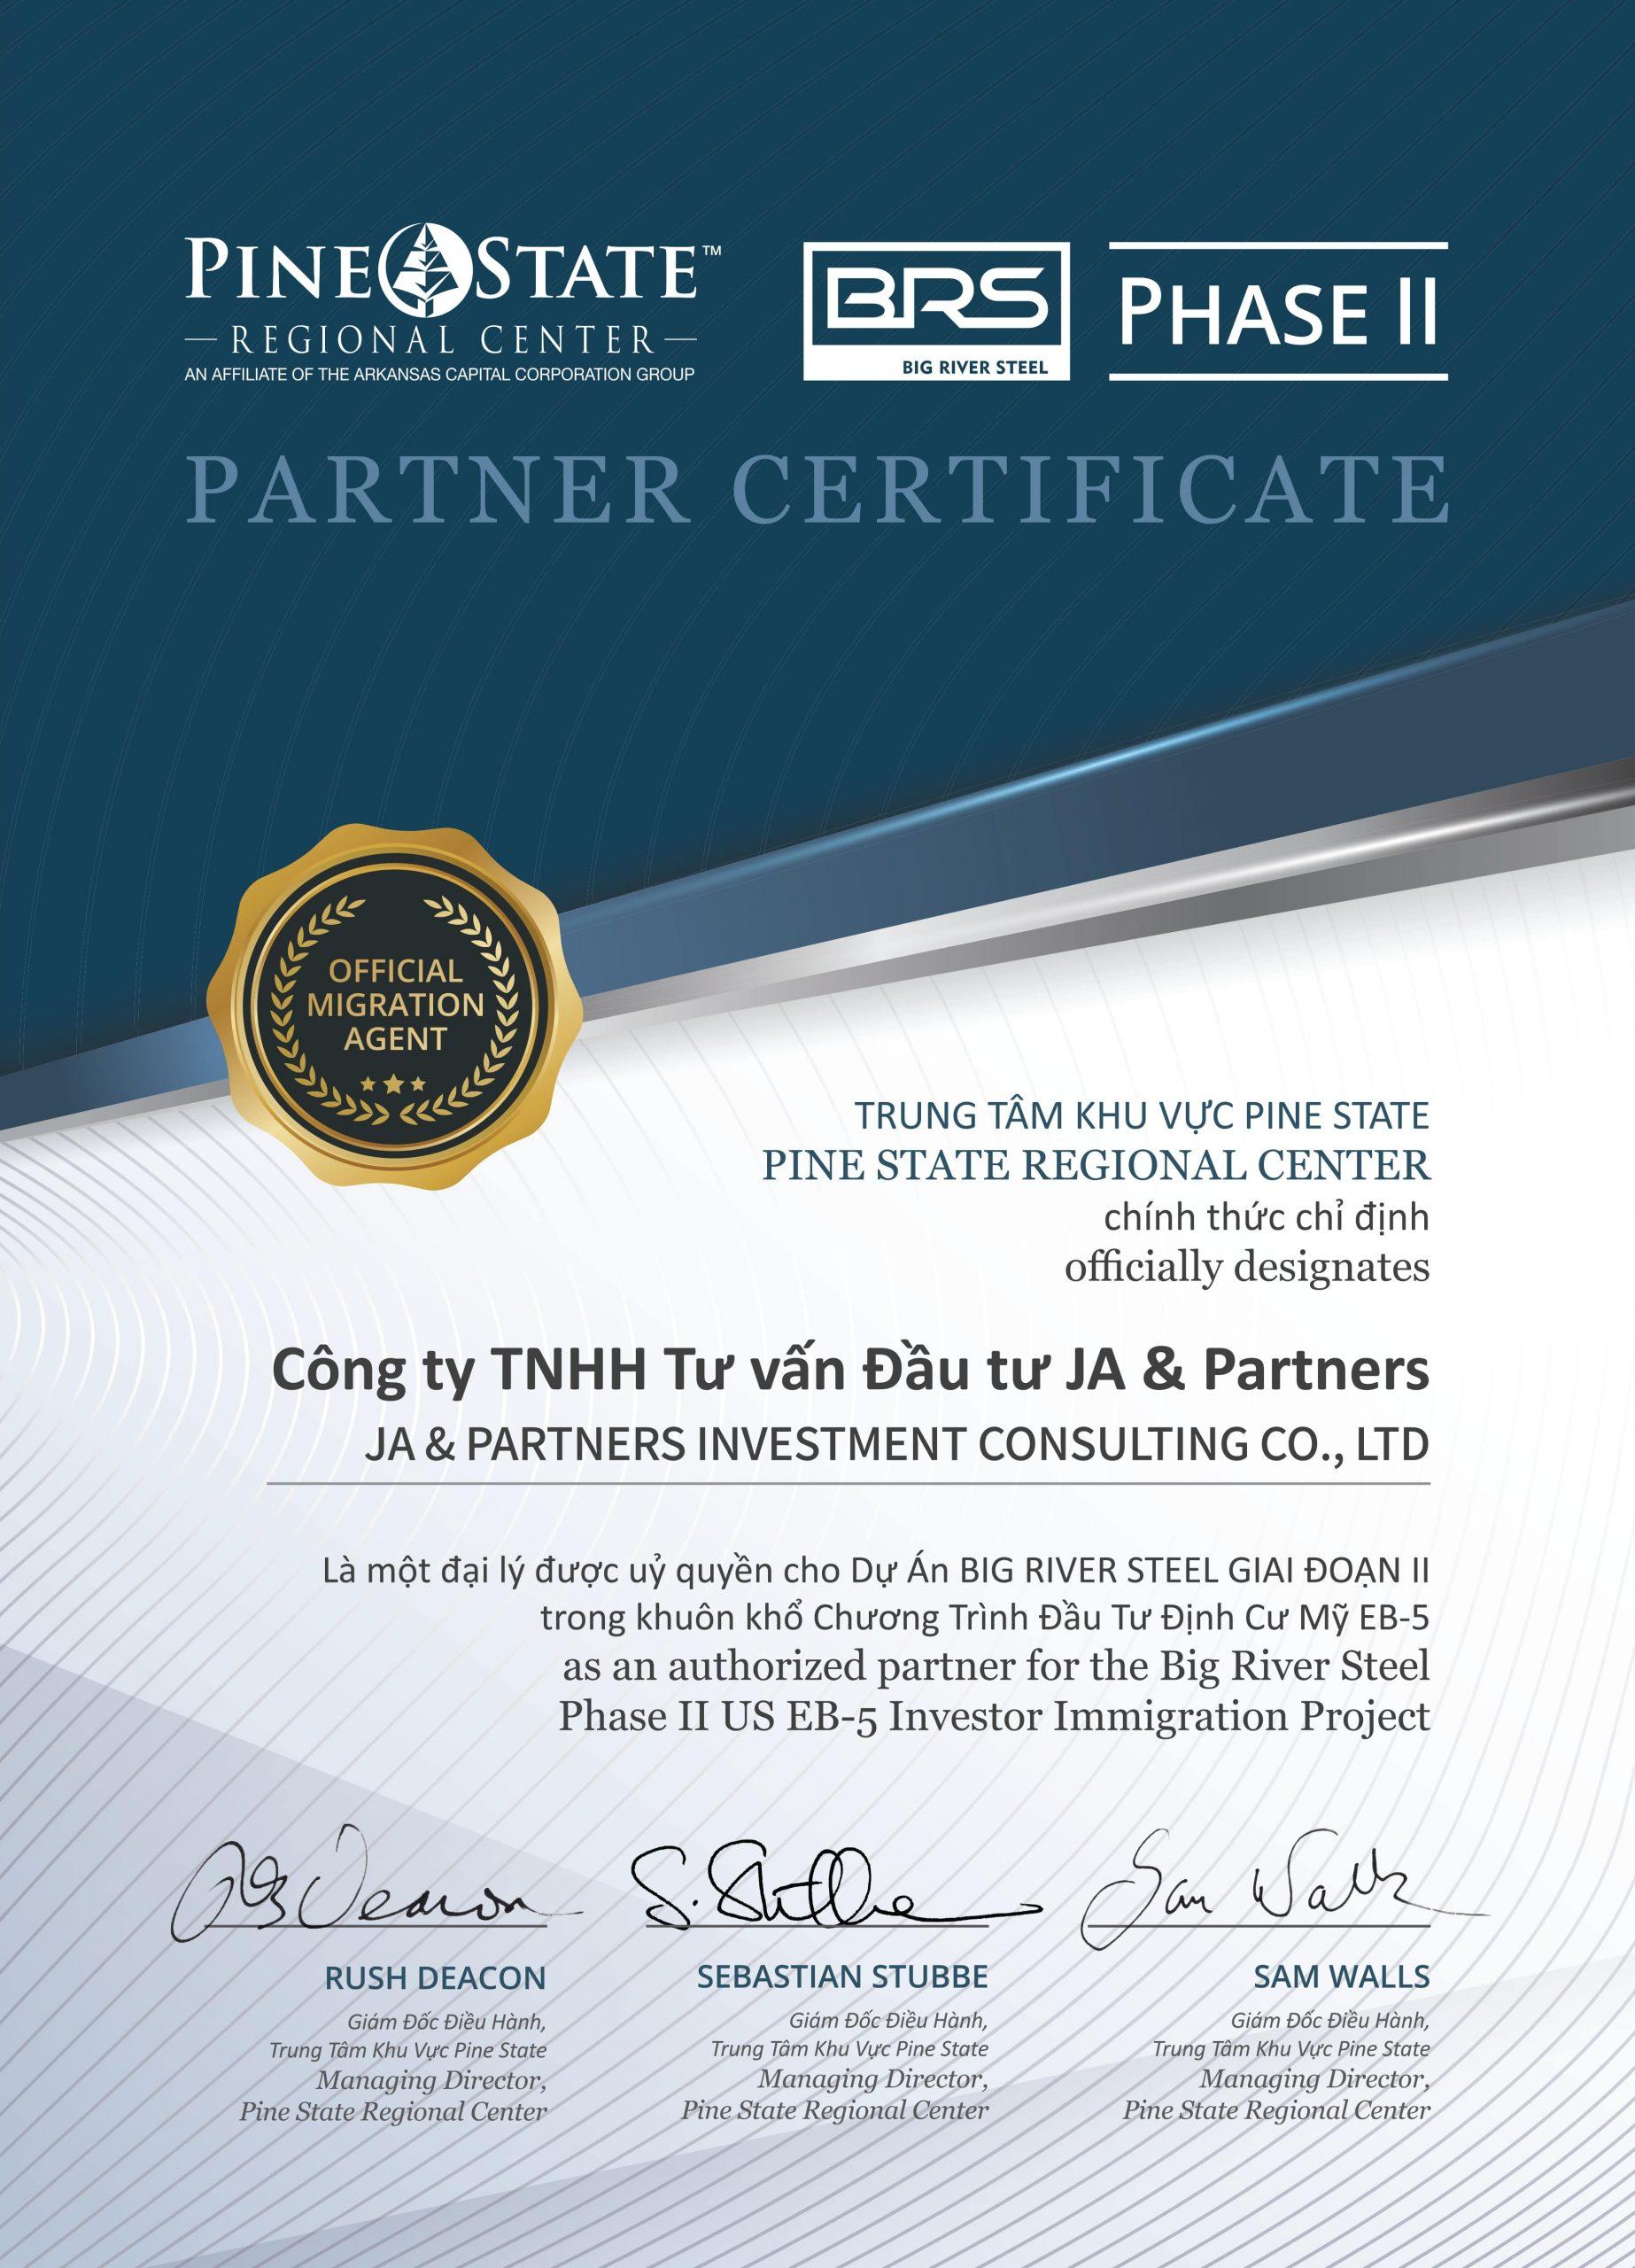 Partnership Certificate_JA & Partners 02 2020